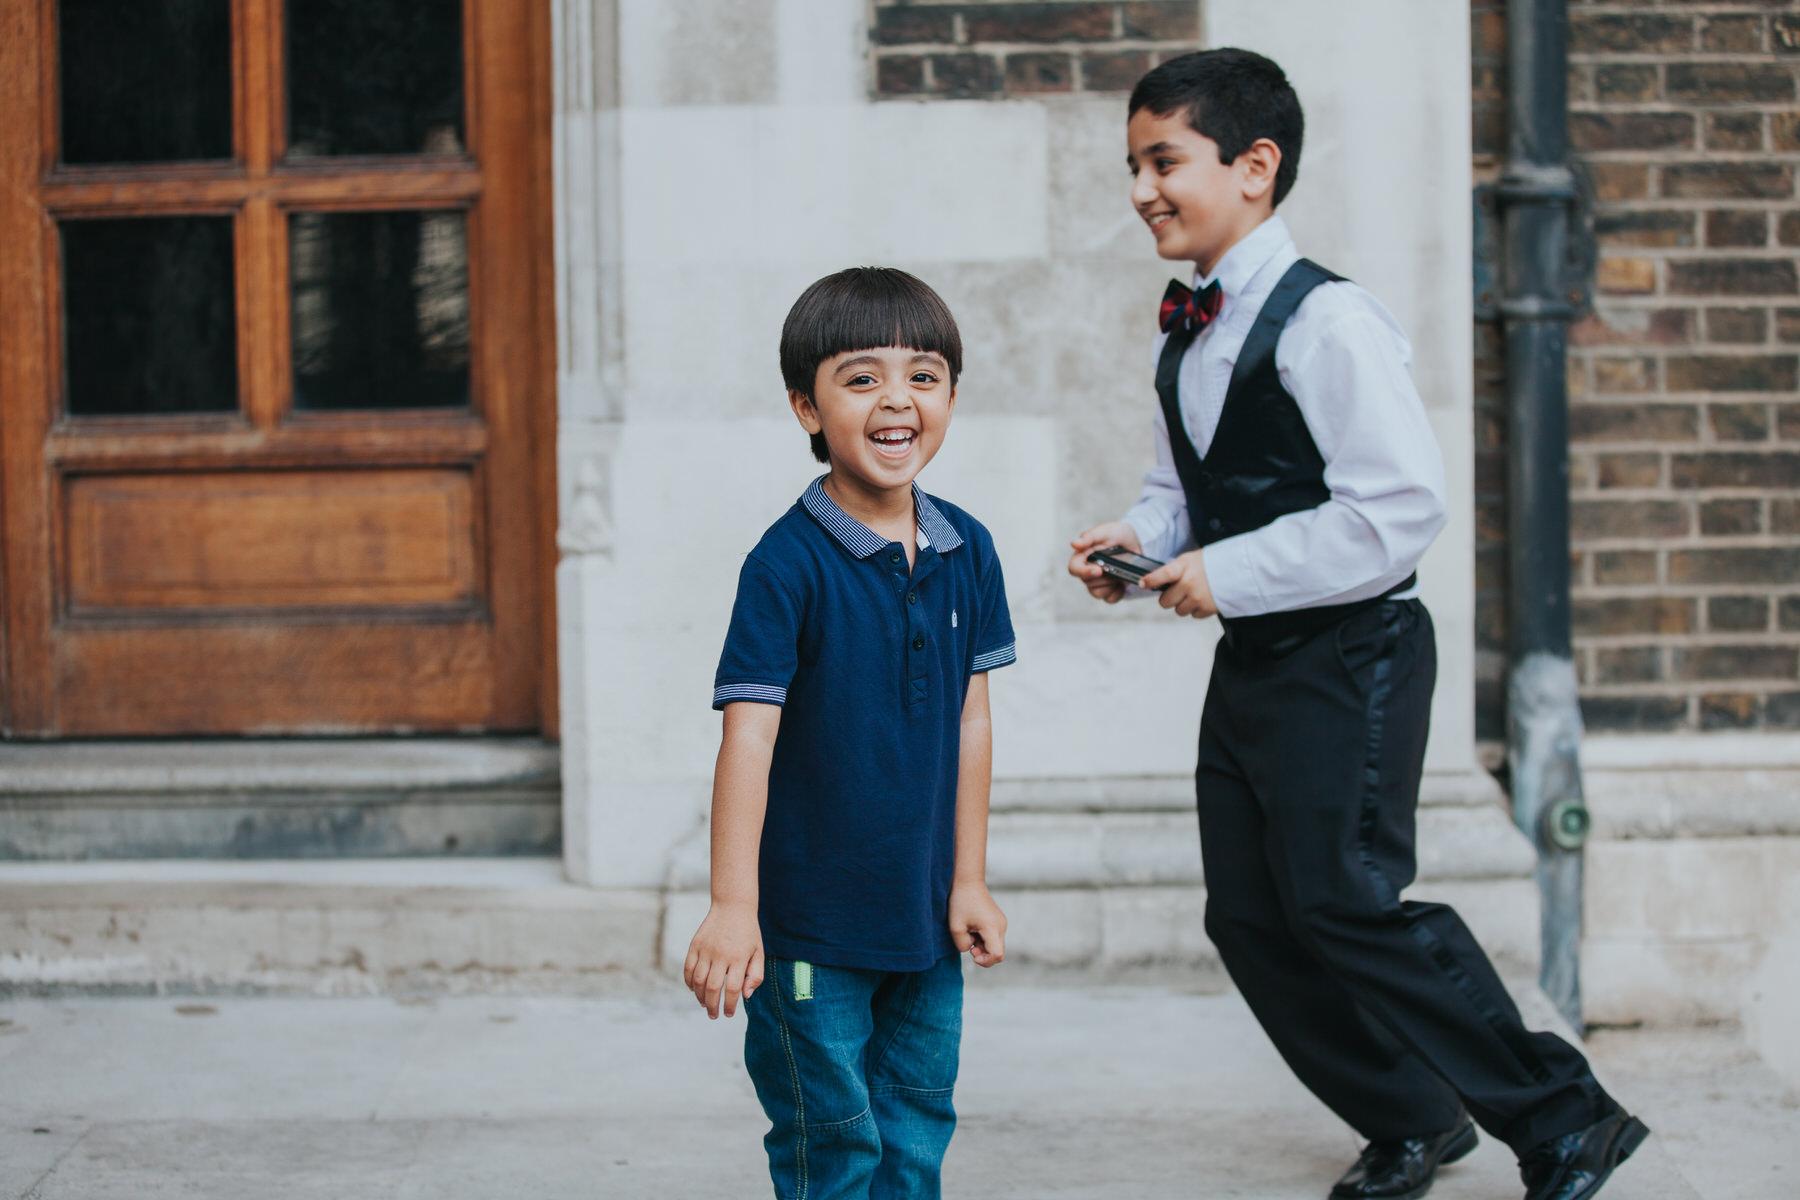 143-Wedding-kids-bouncing-around.jpg